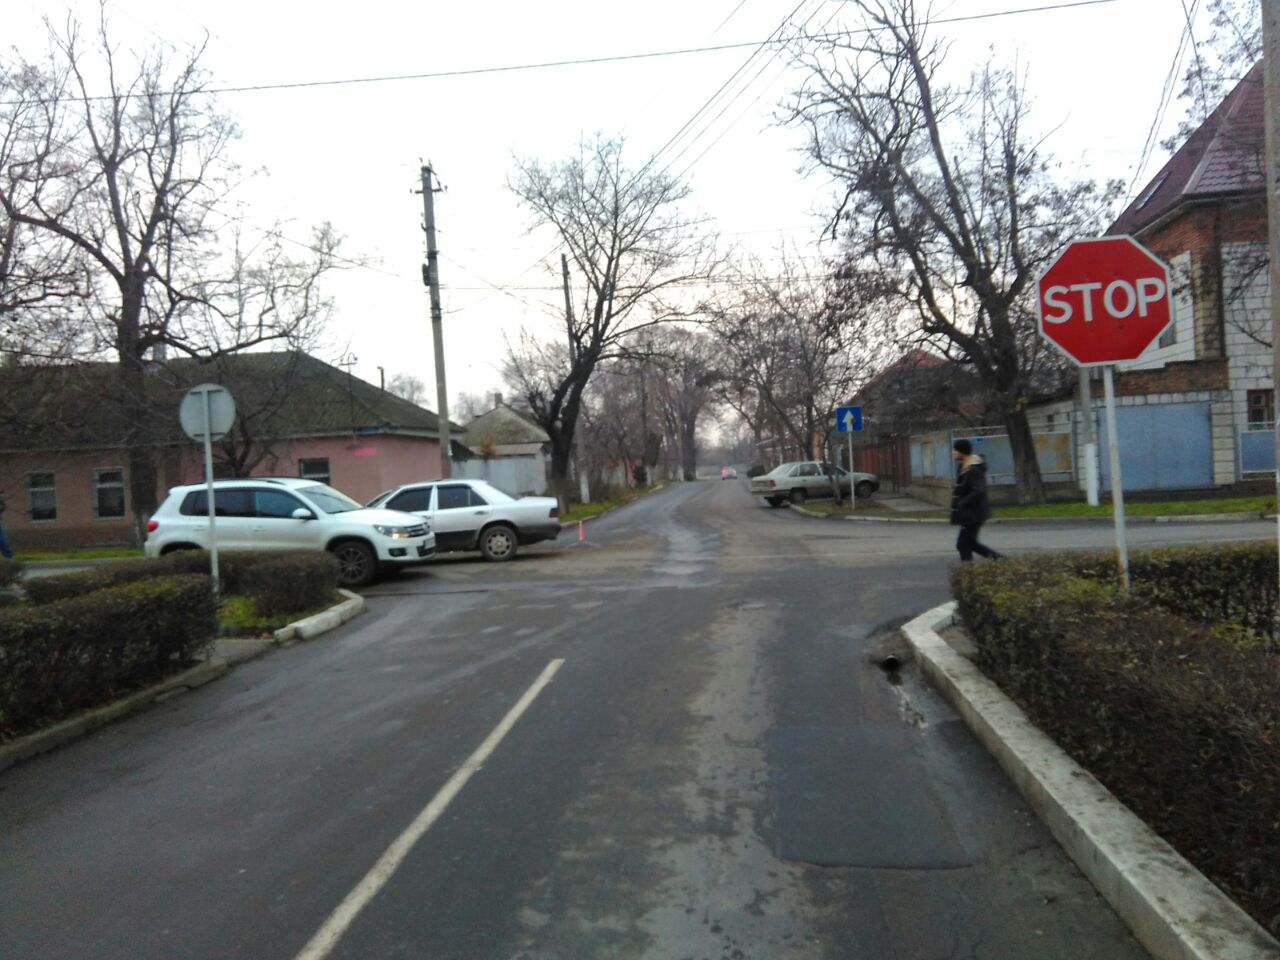 23463246 Бильярд на дороге: в Измаиле Mercedes протаранил BMW и Volkswagen